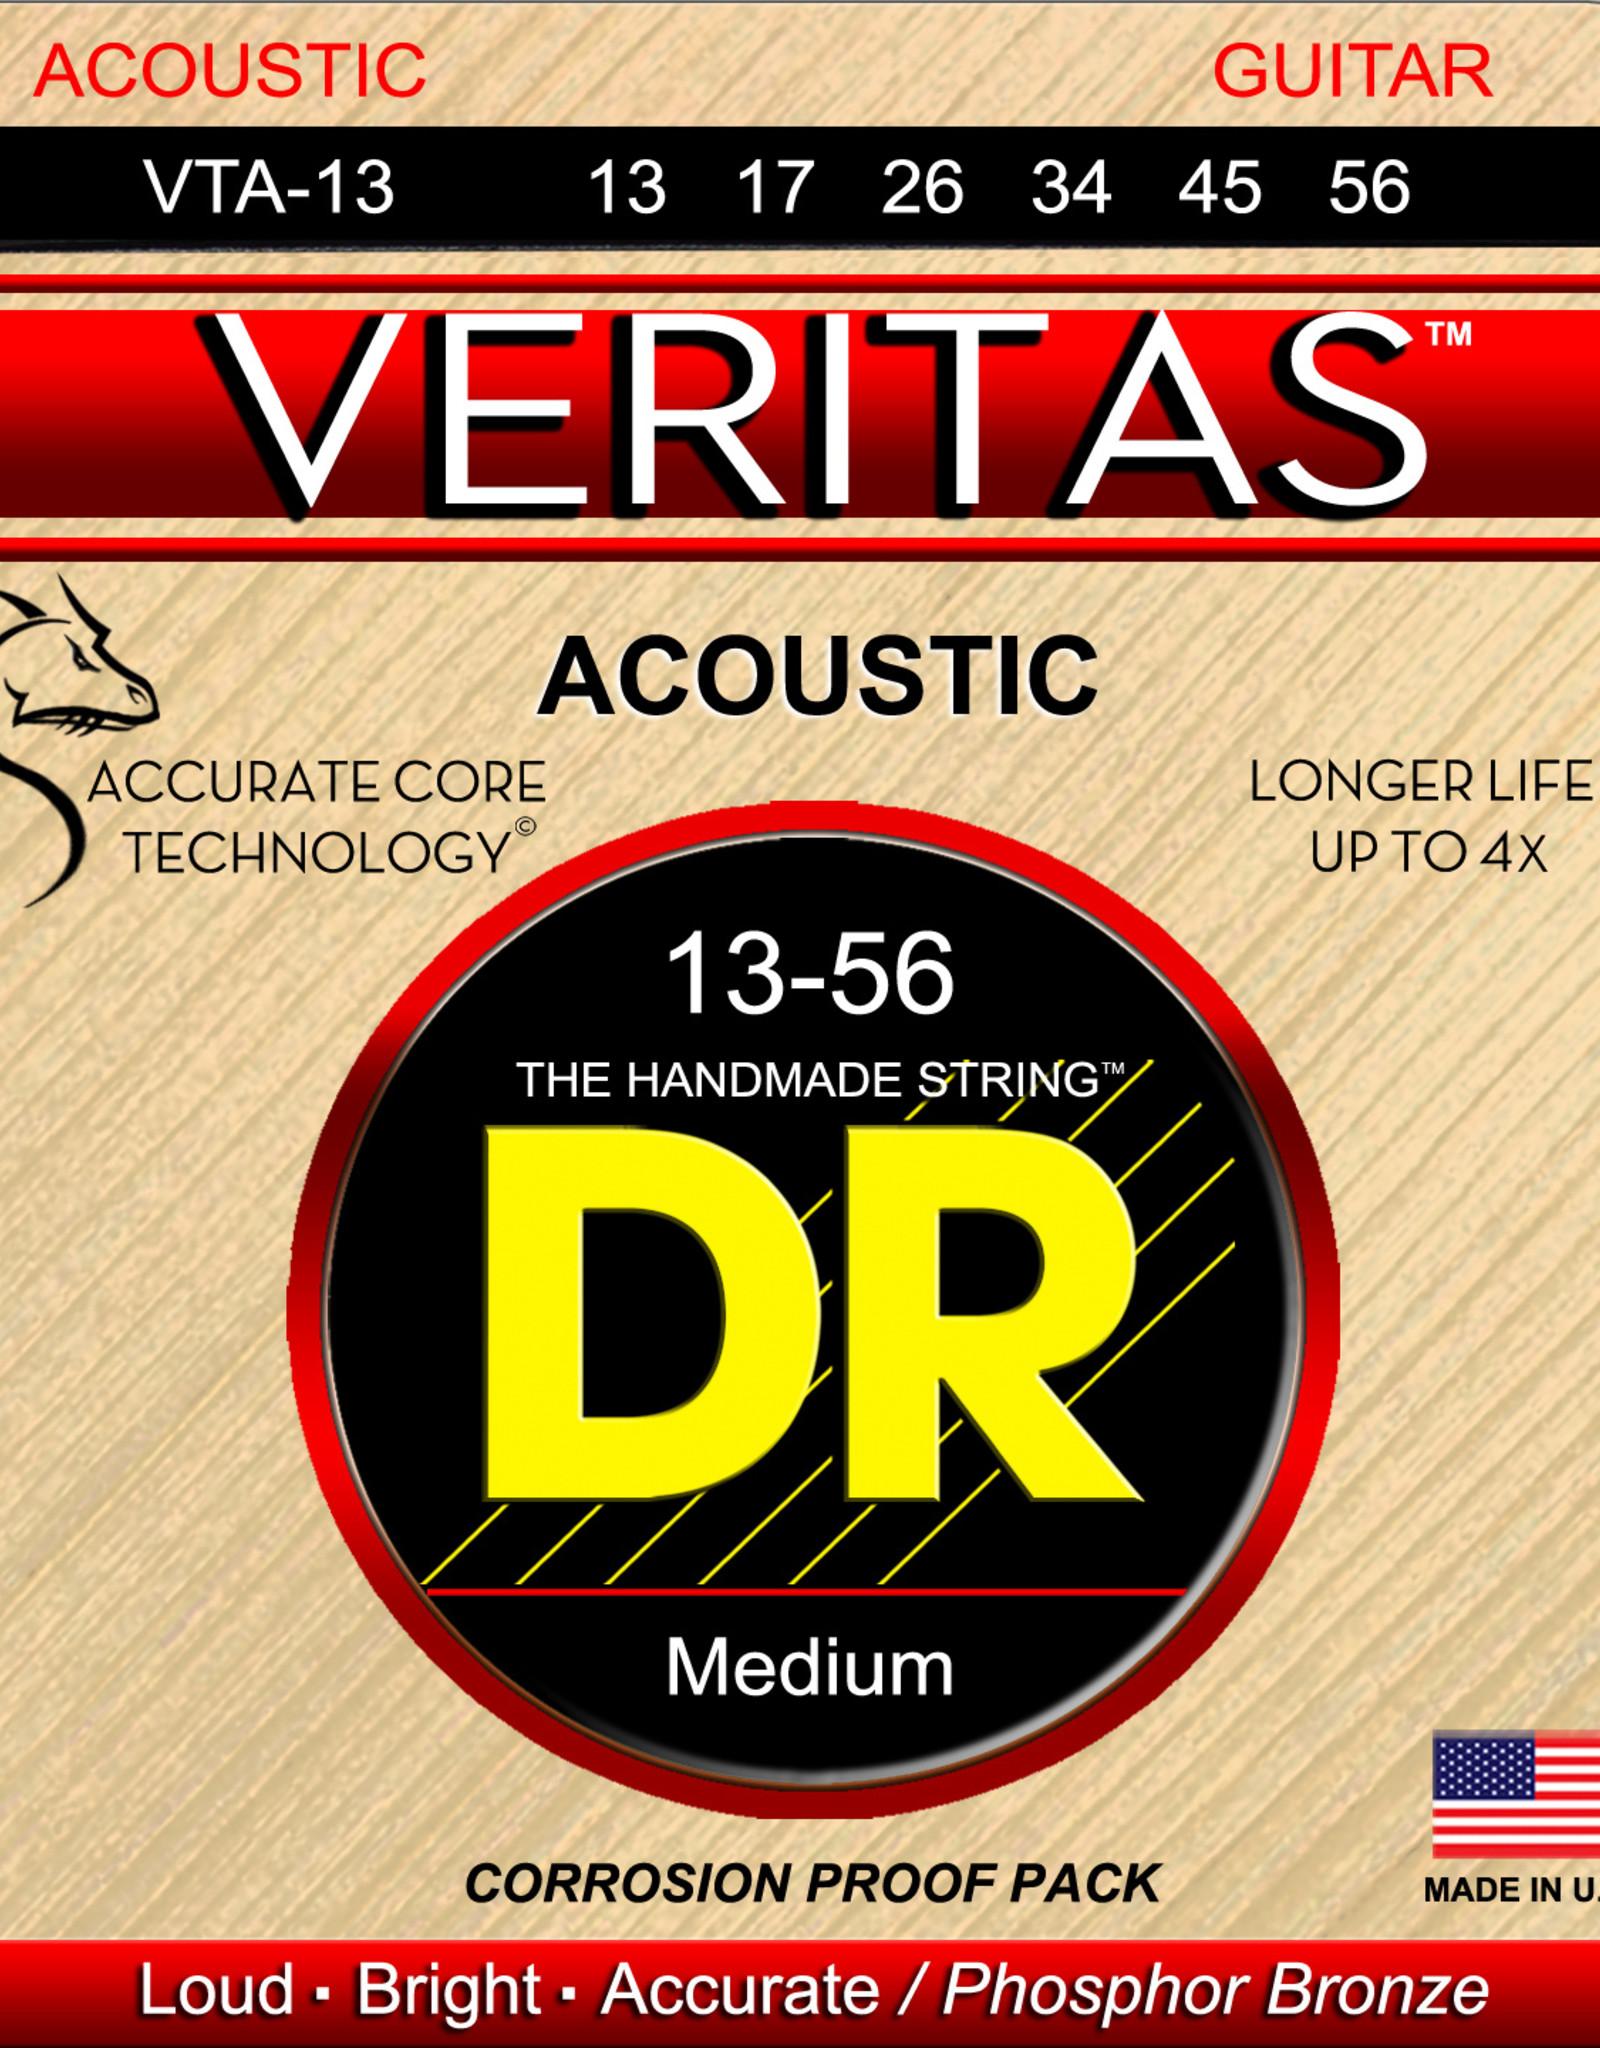 DR DR VERITAS™ - Coated Core Technology Acoustic Guitar Strings: Medium 13-56